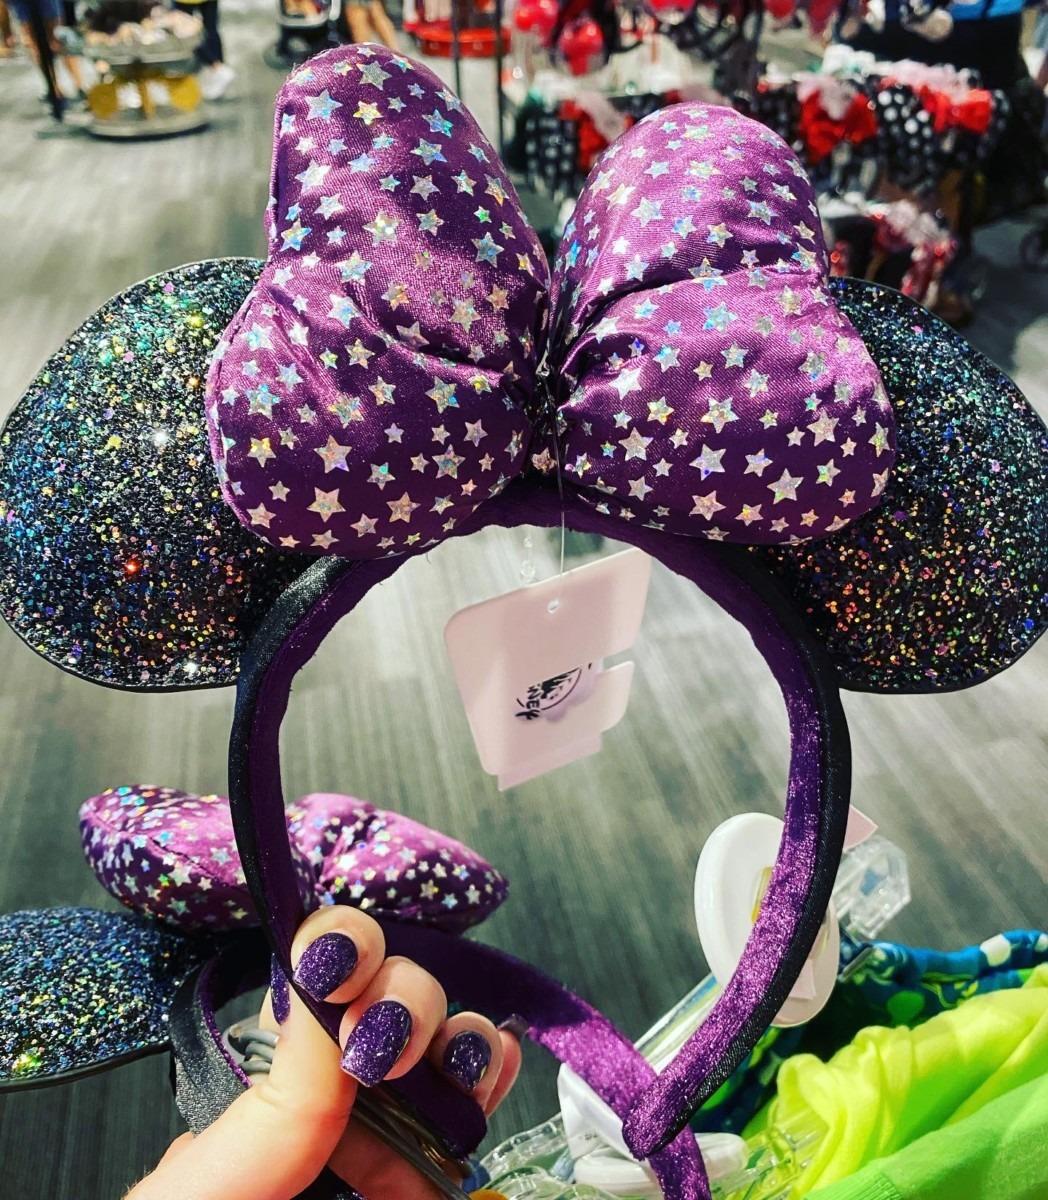 New Celestial Minnie Ears Now at Walt Disney World 2